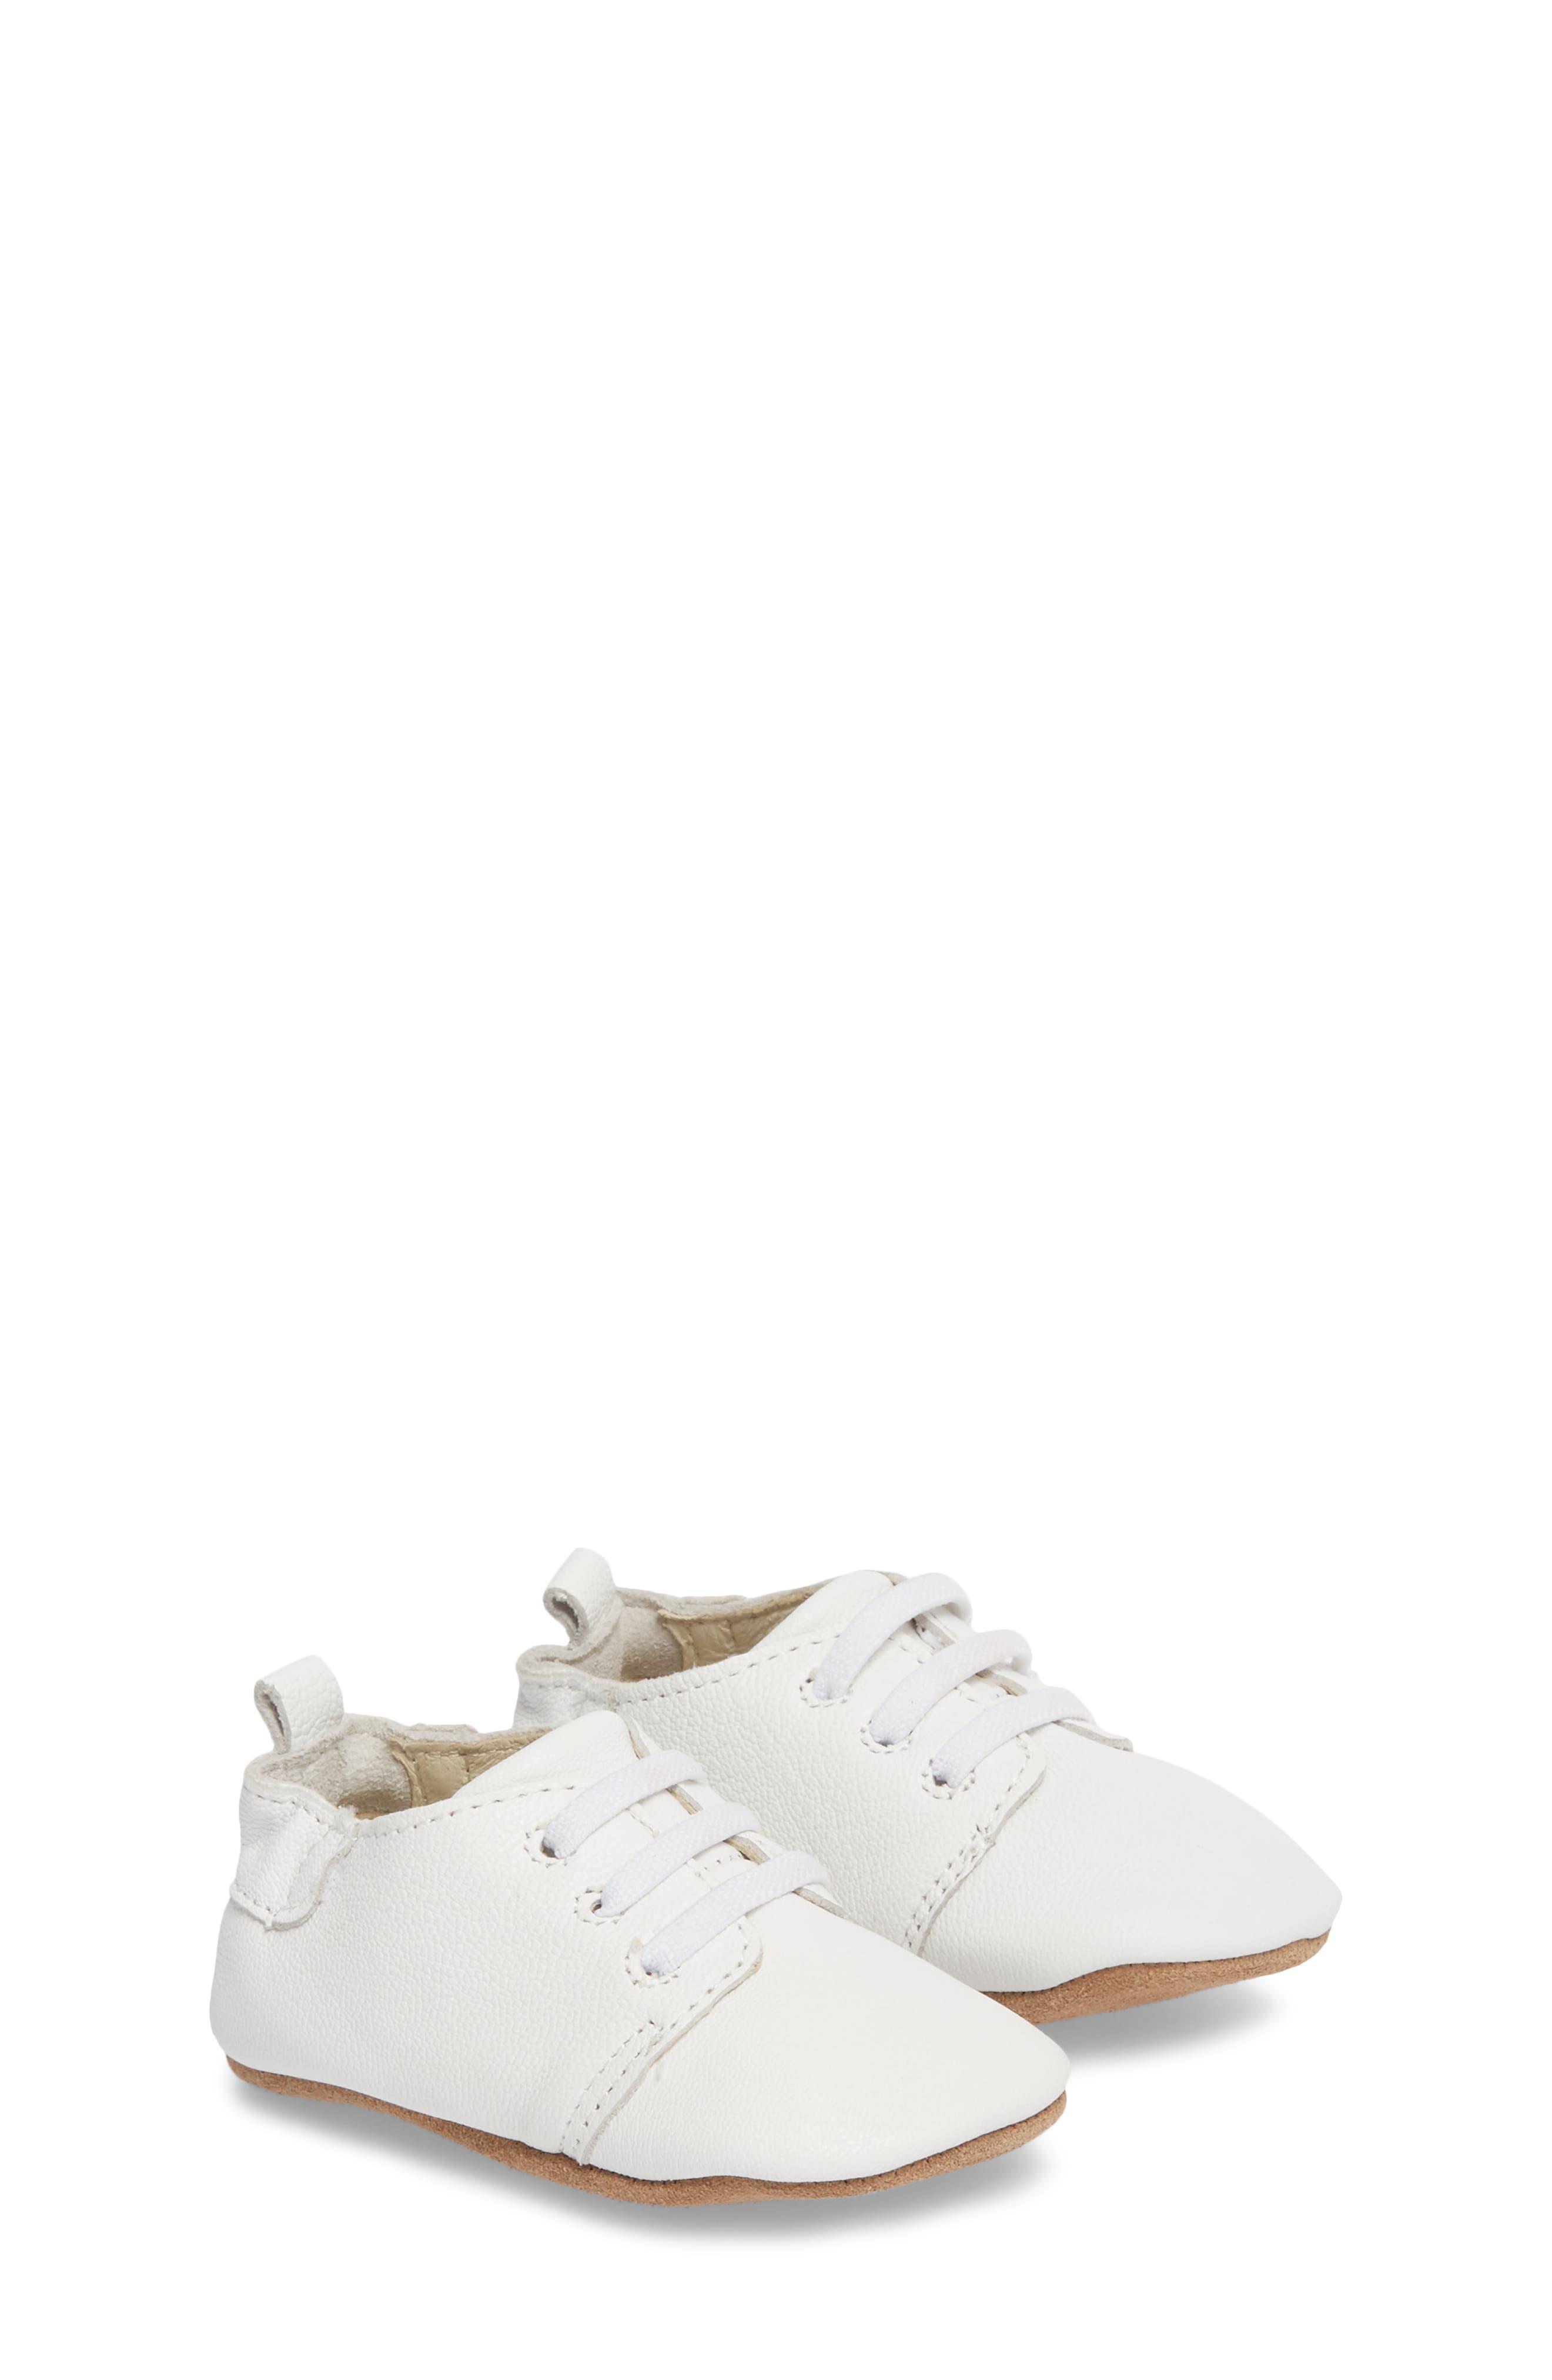 ROBEEZ<SUP>®</SUP> Owen Oxford Crib Shoe, Main, color, WHITE